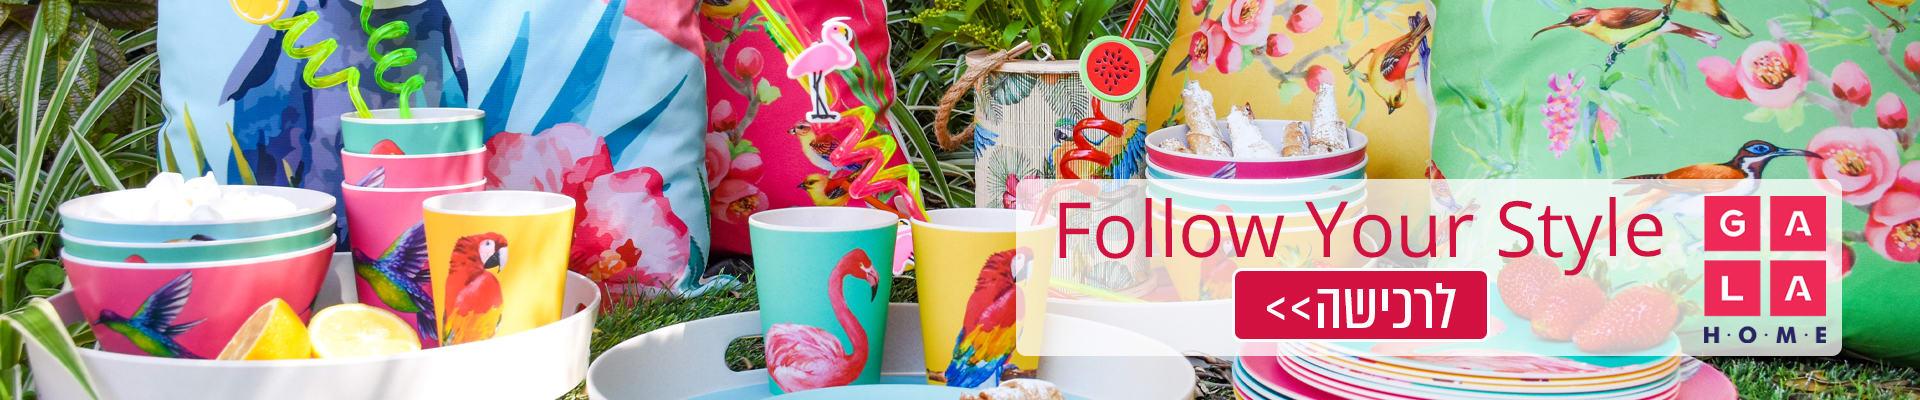 Follow your style GALA : קולקציית פלמינגו